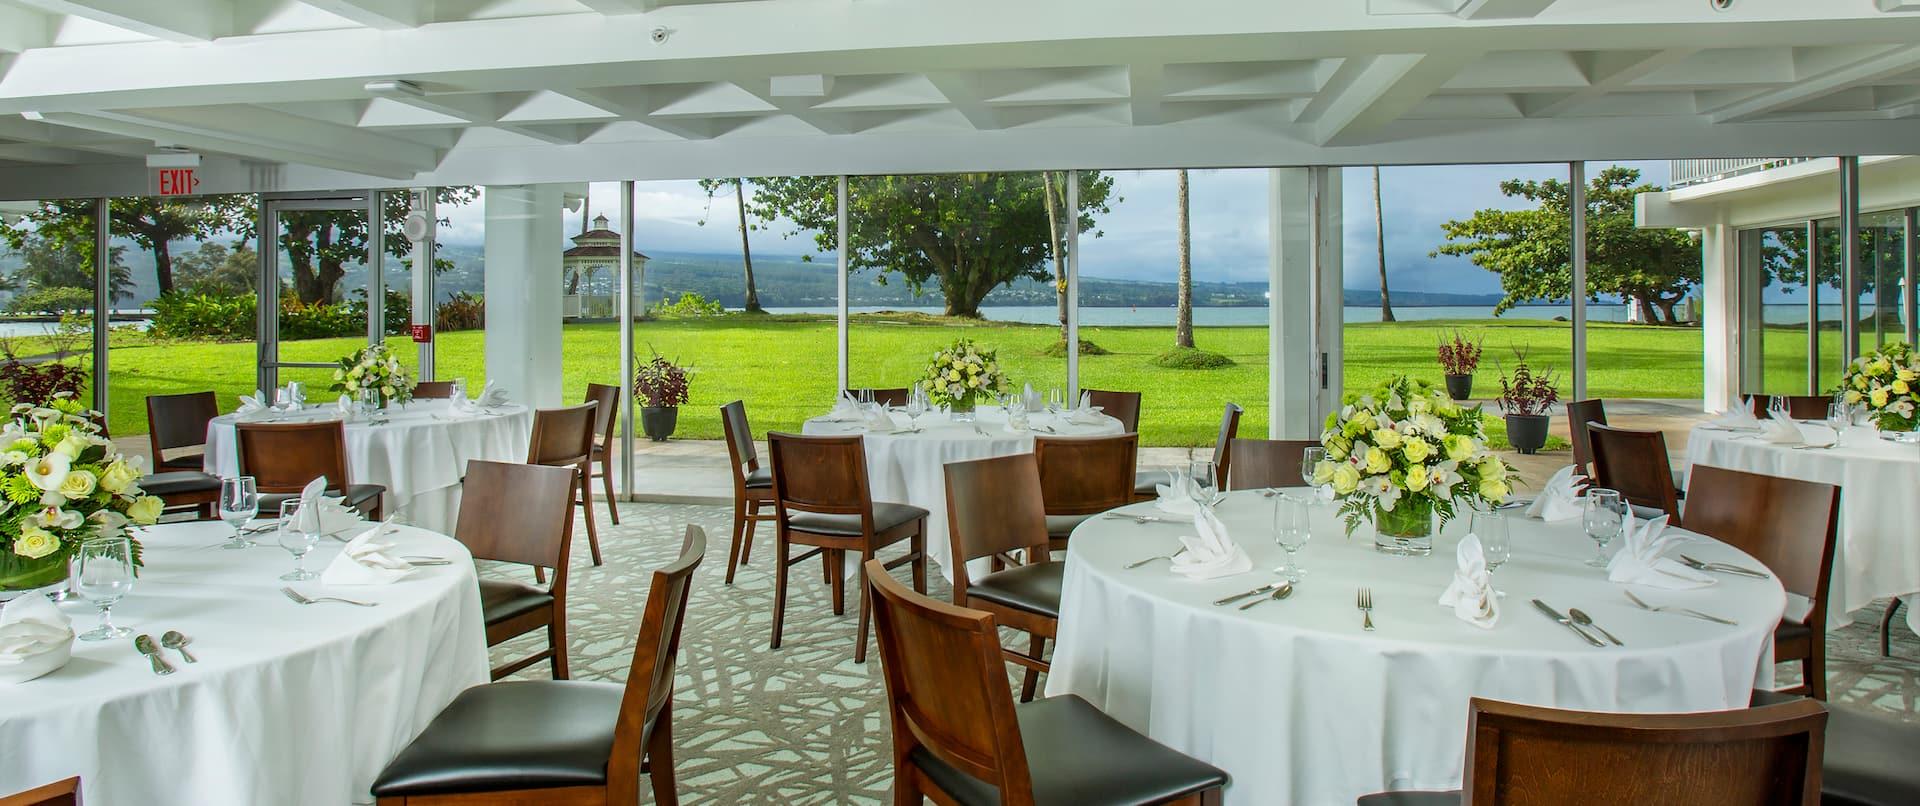 Sandlewood Banquet Room